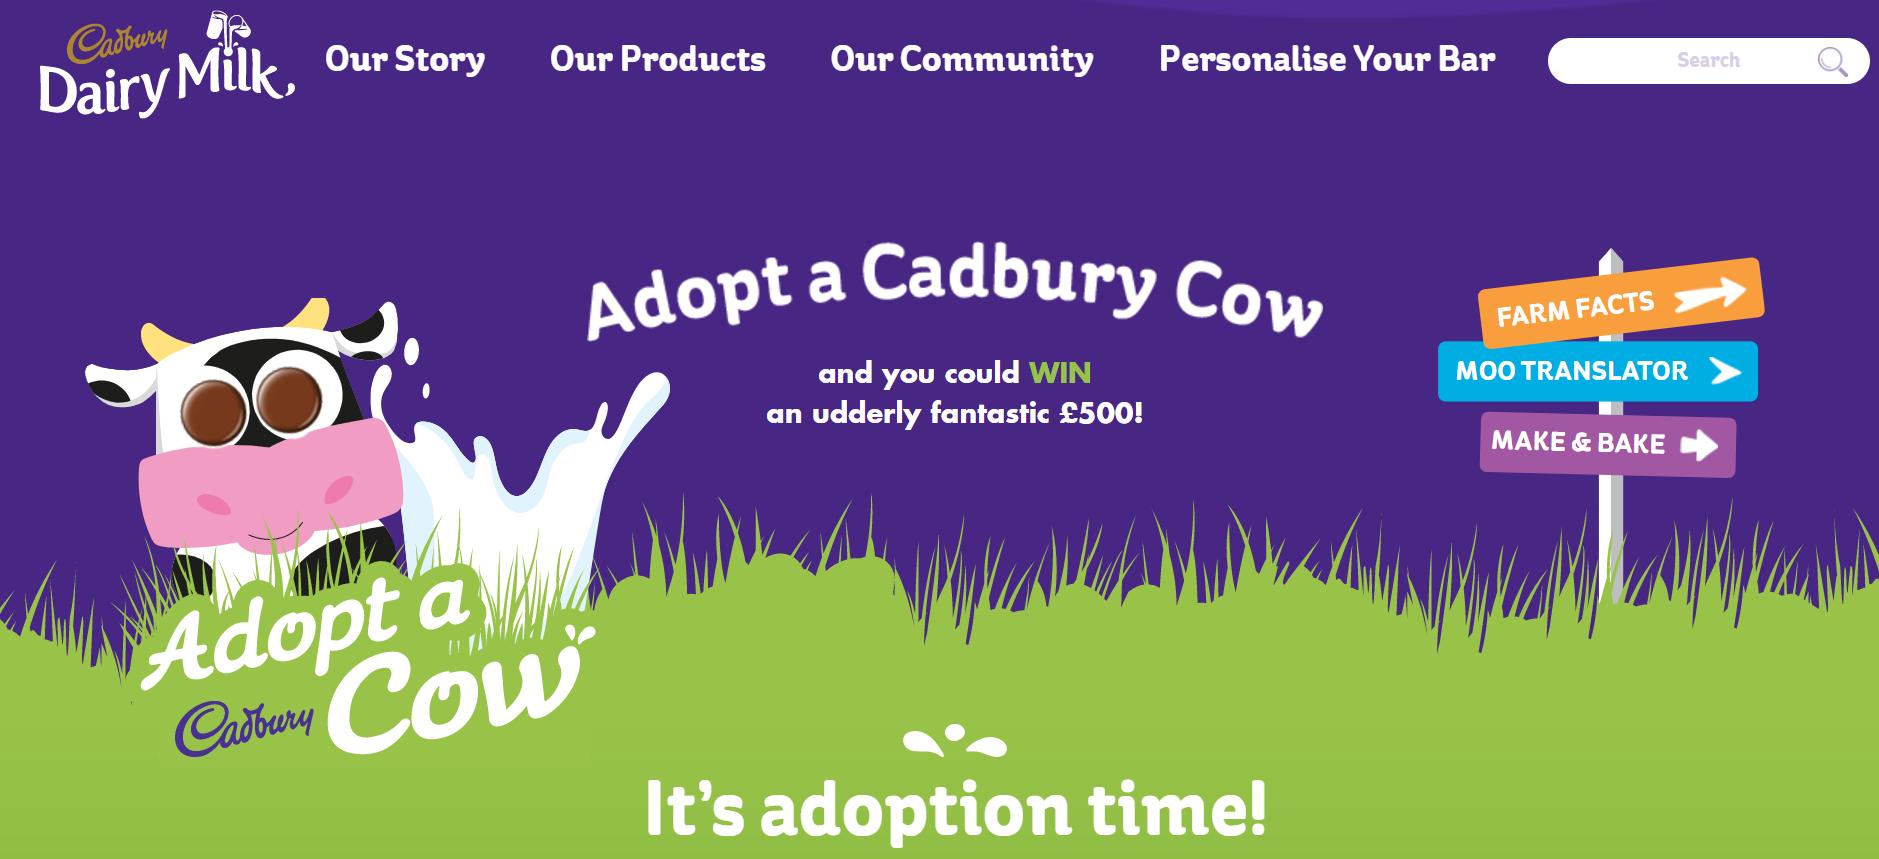 Cadbury's experiential reward pulled the heart strings